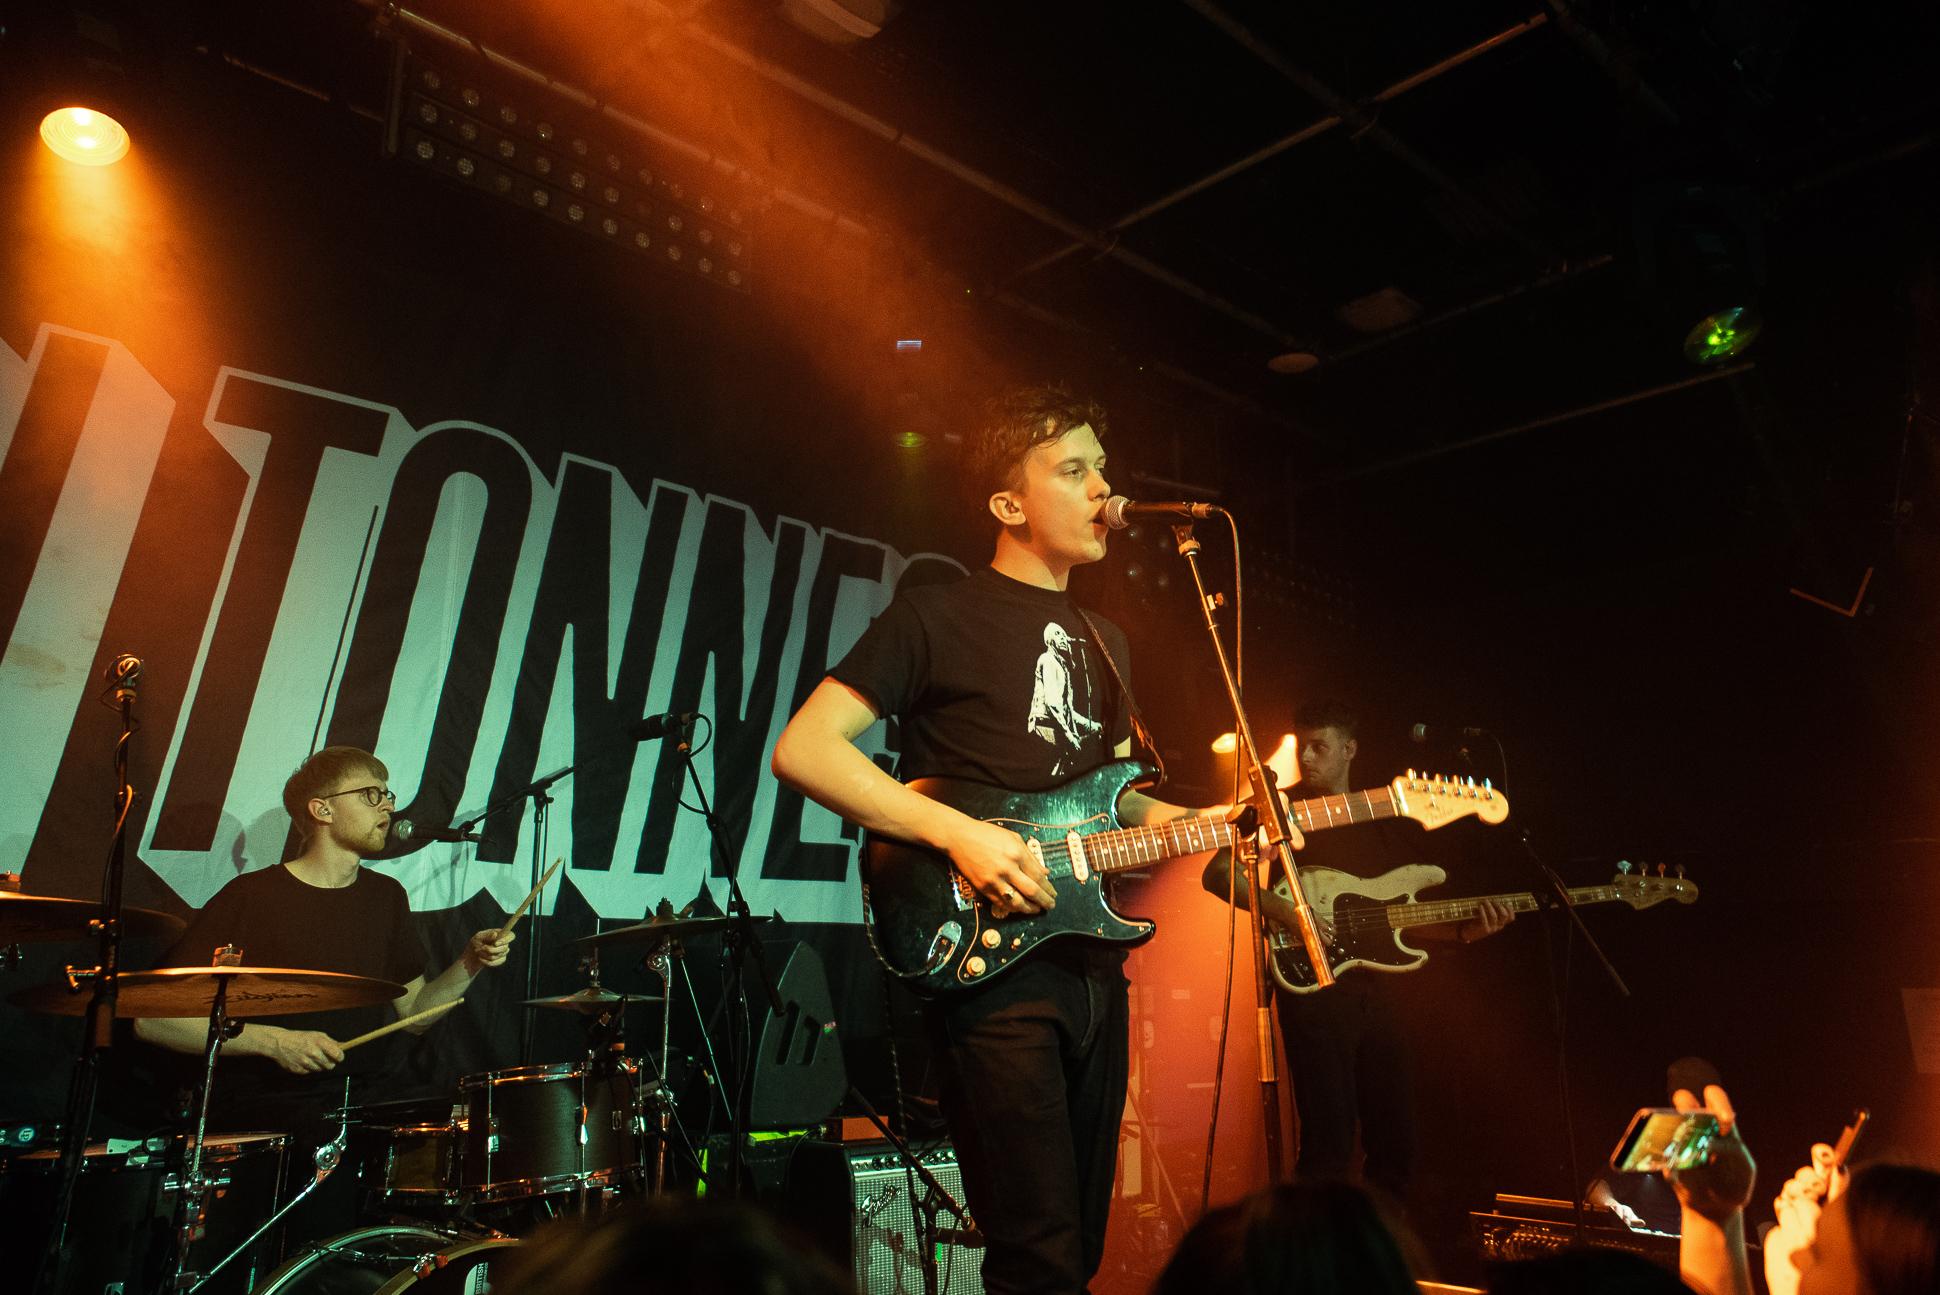 Ten Tonnes - Gorilla - Manchester - 14-05-19-8.jpg